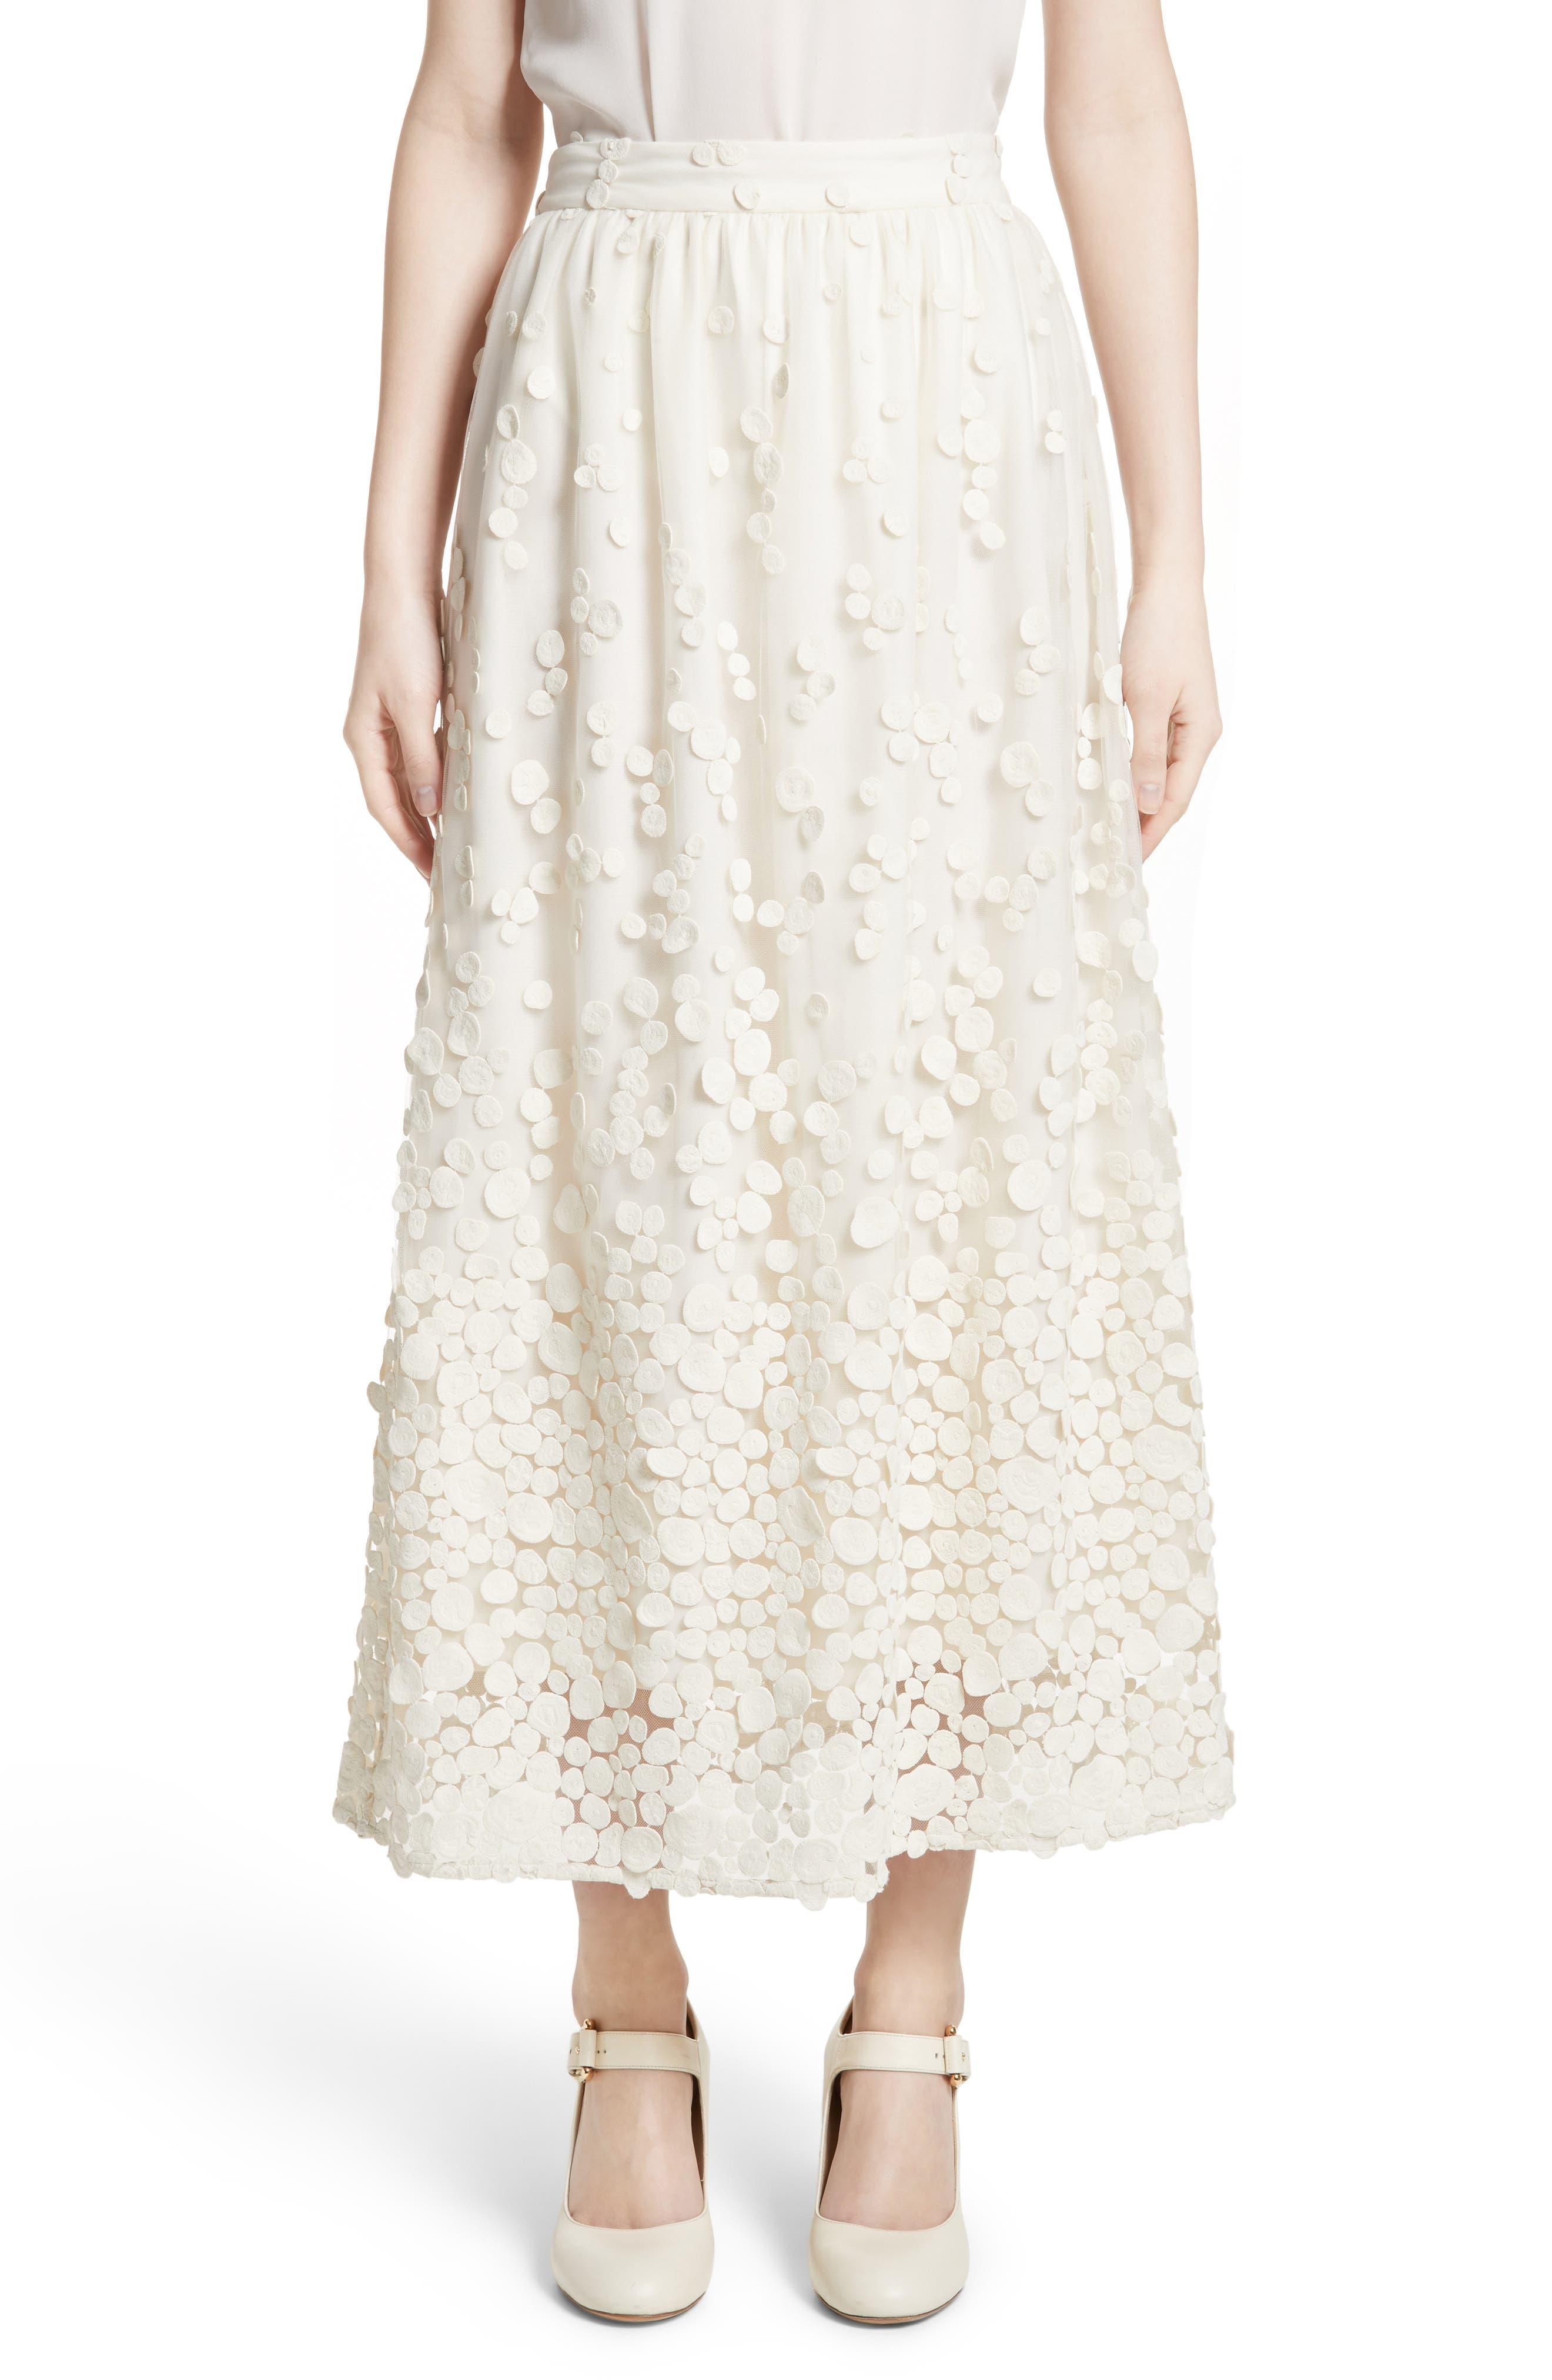 Co Pebbles Embroidered Mesh Midi Skirt